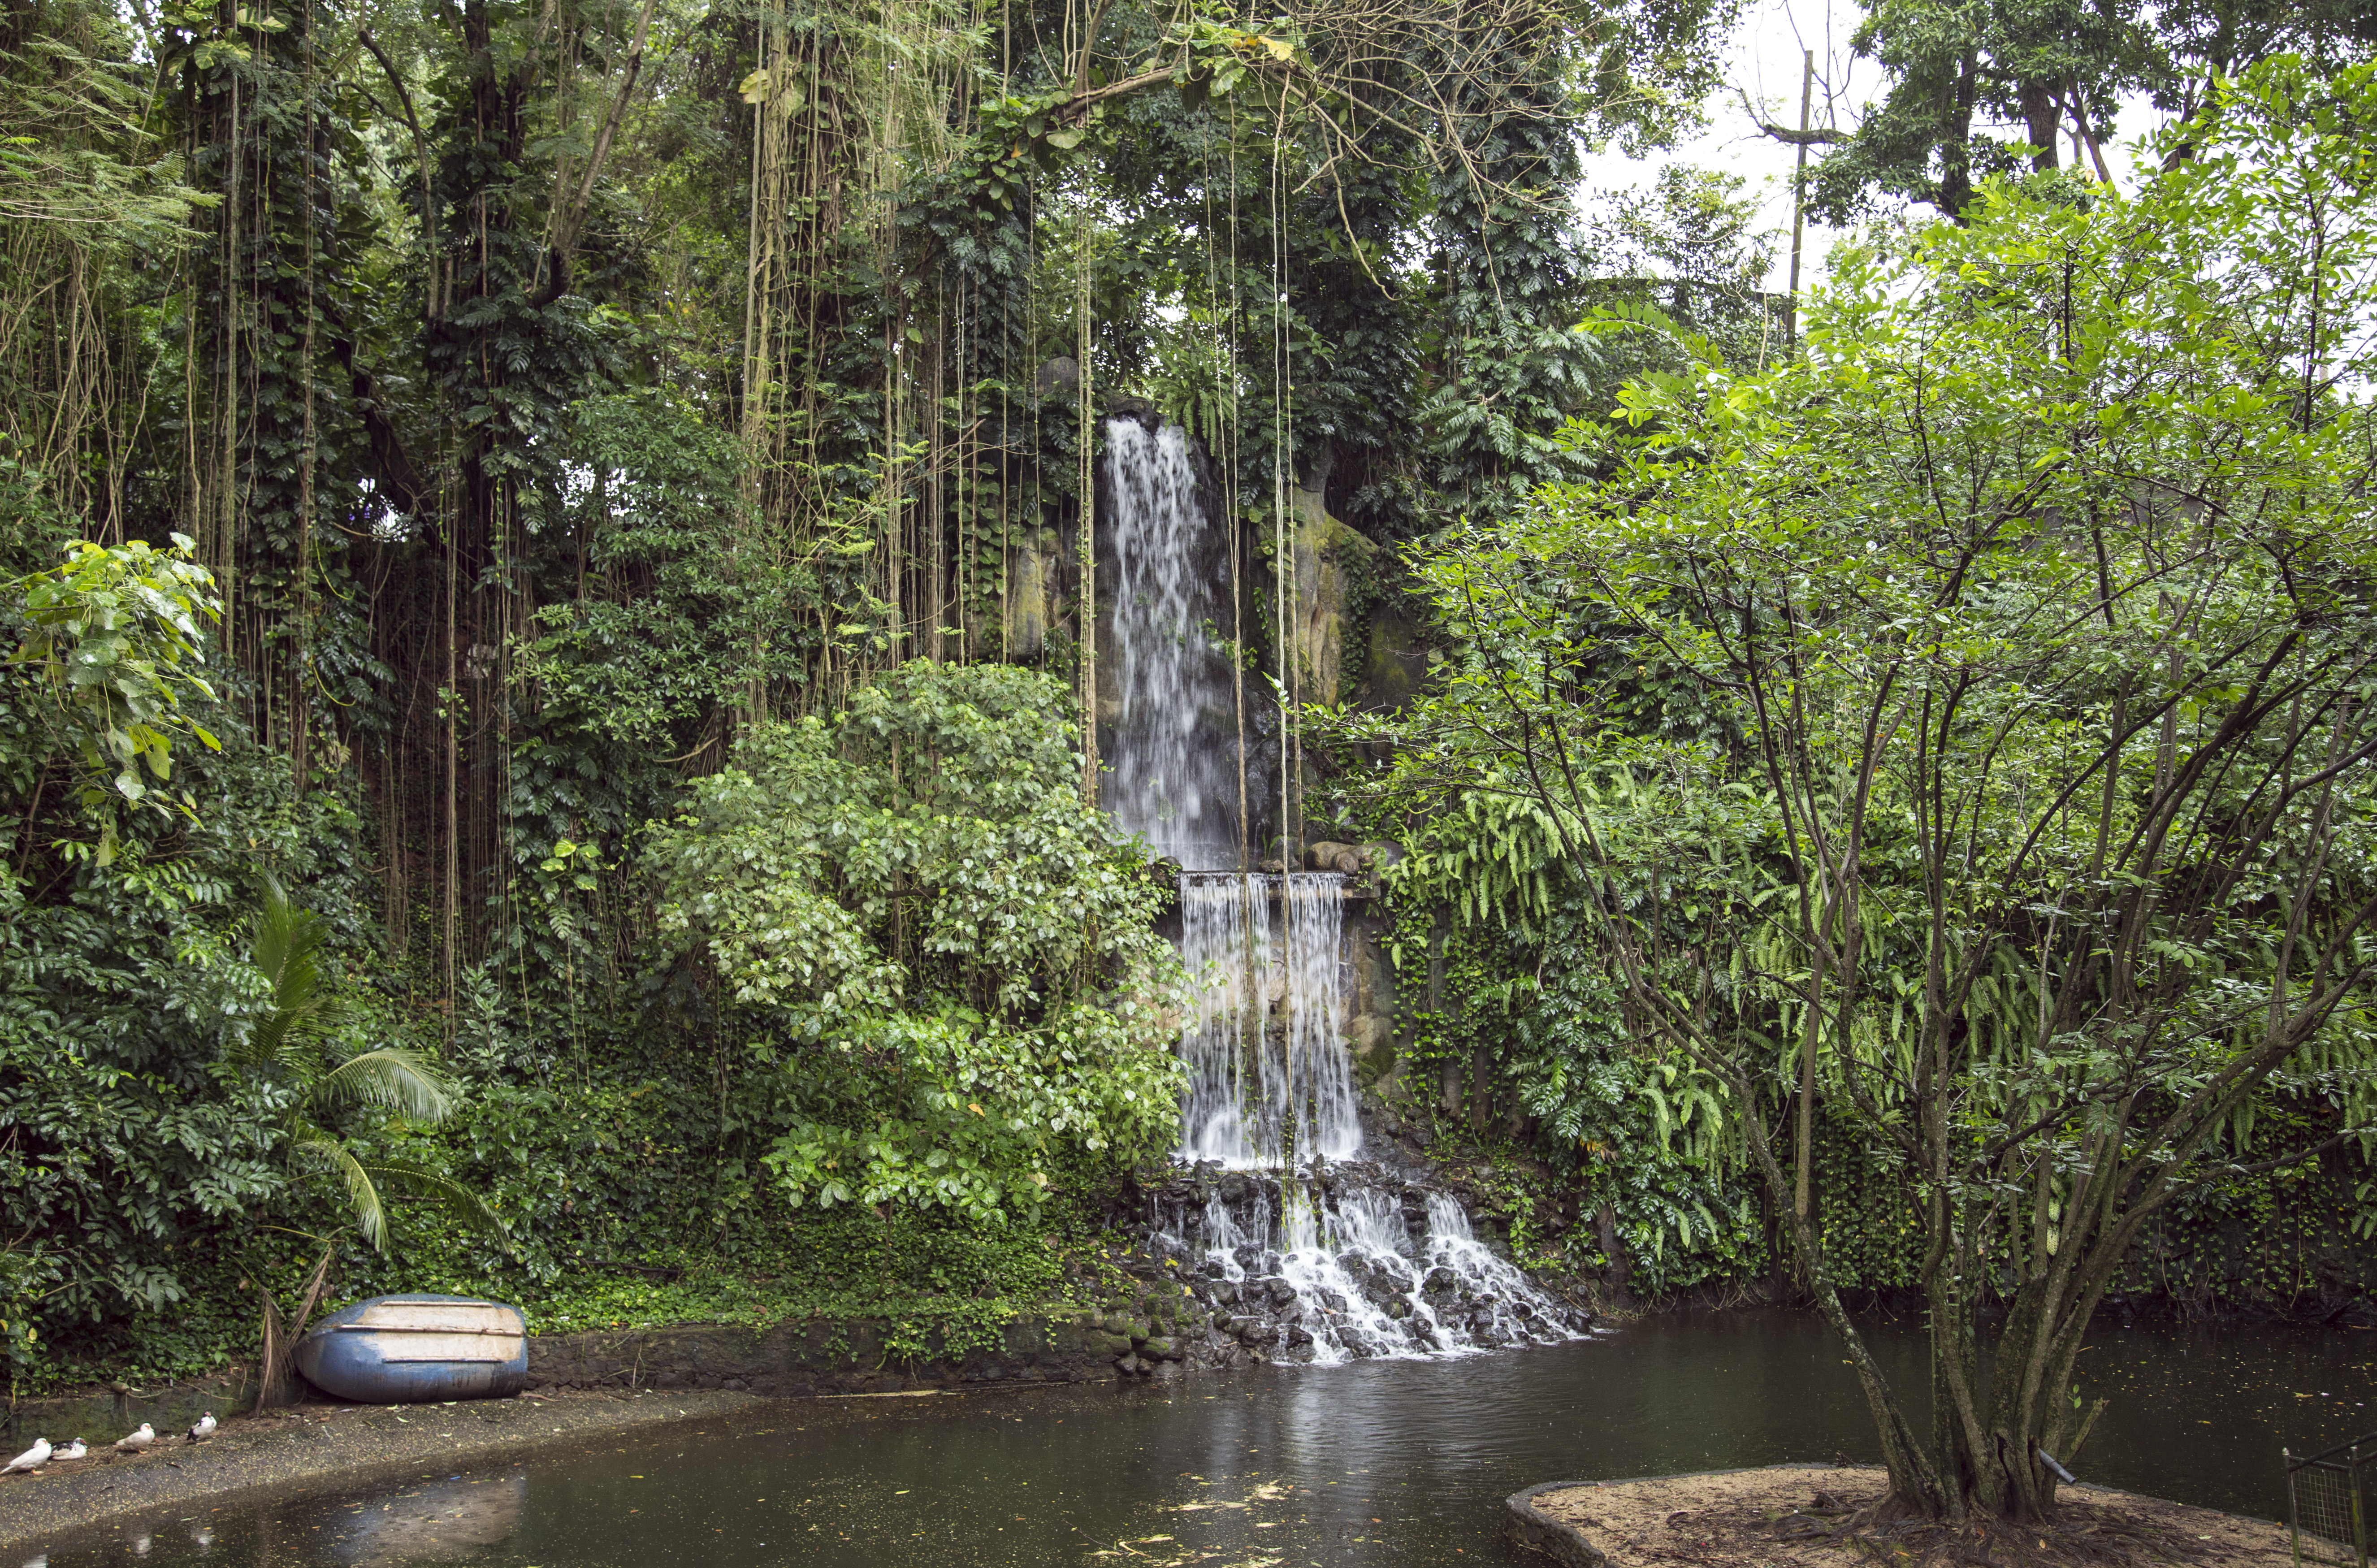 Waterfall in the jungle photo